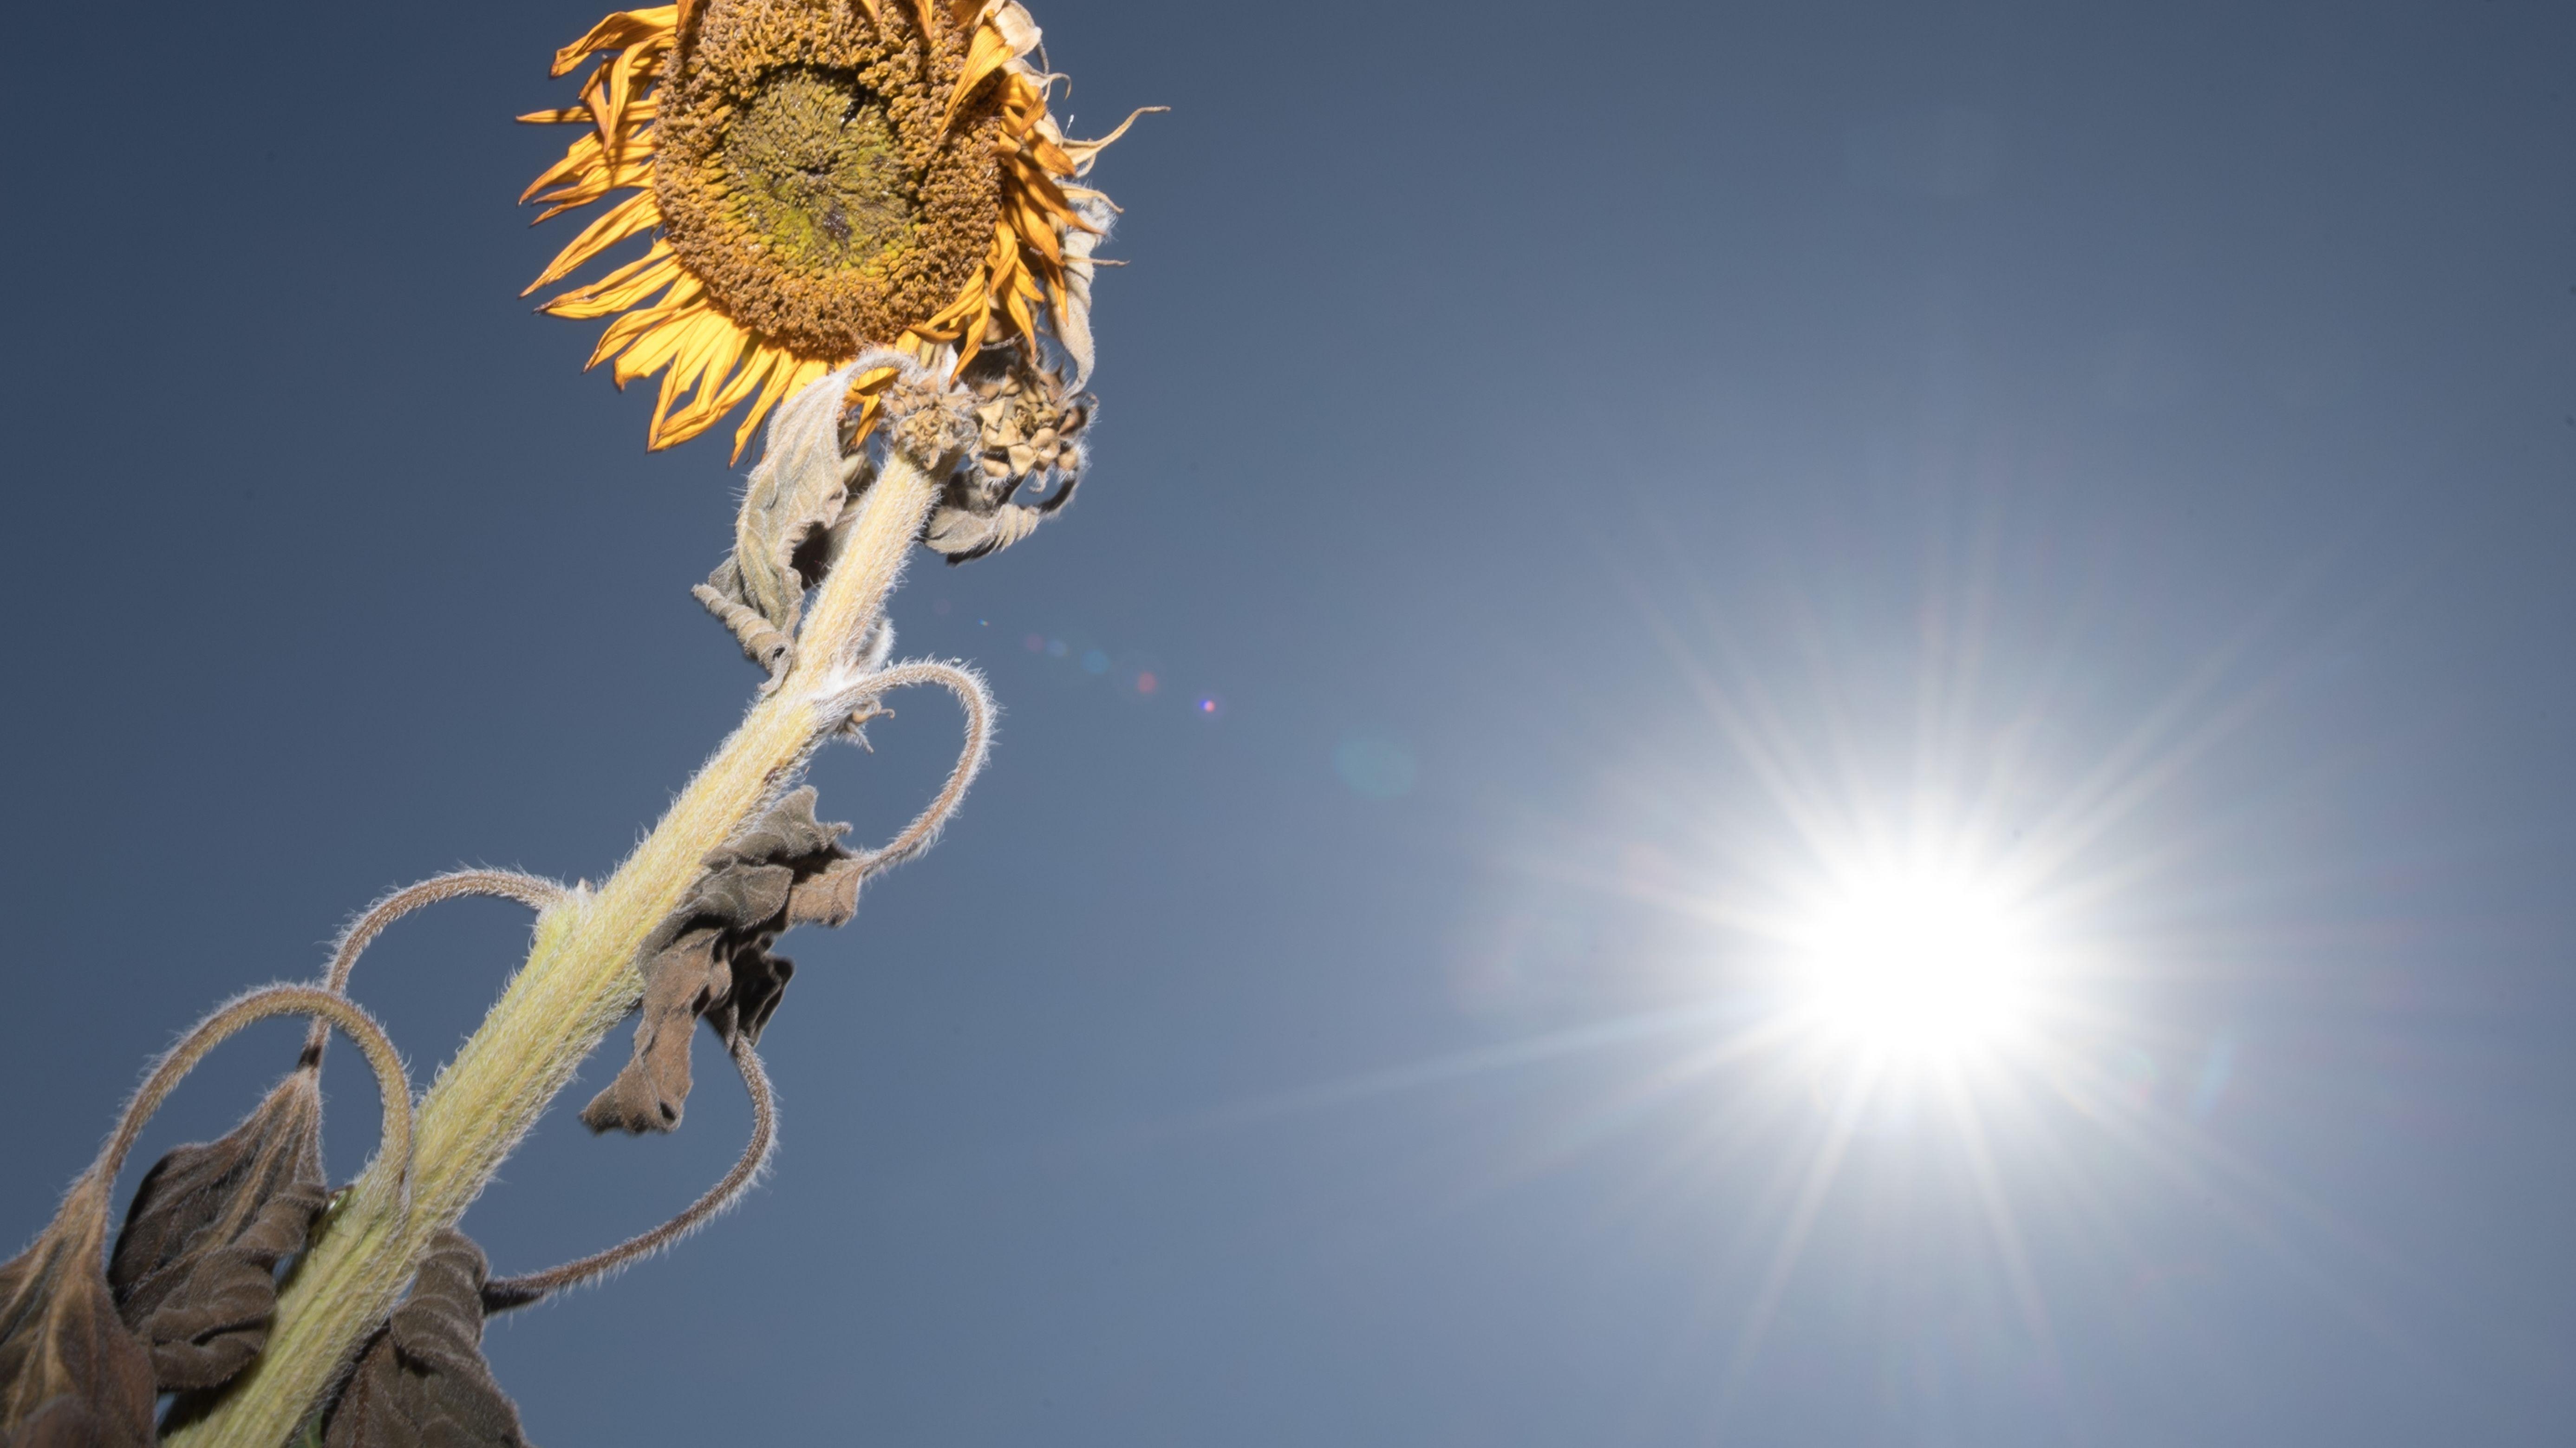 Sonnenblume vor Sonne